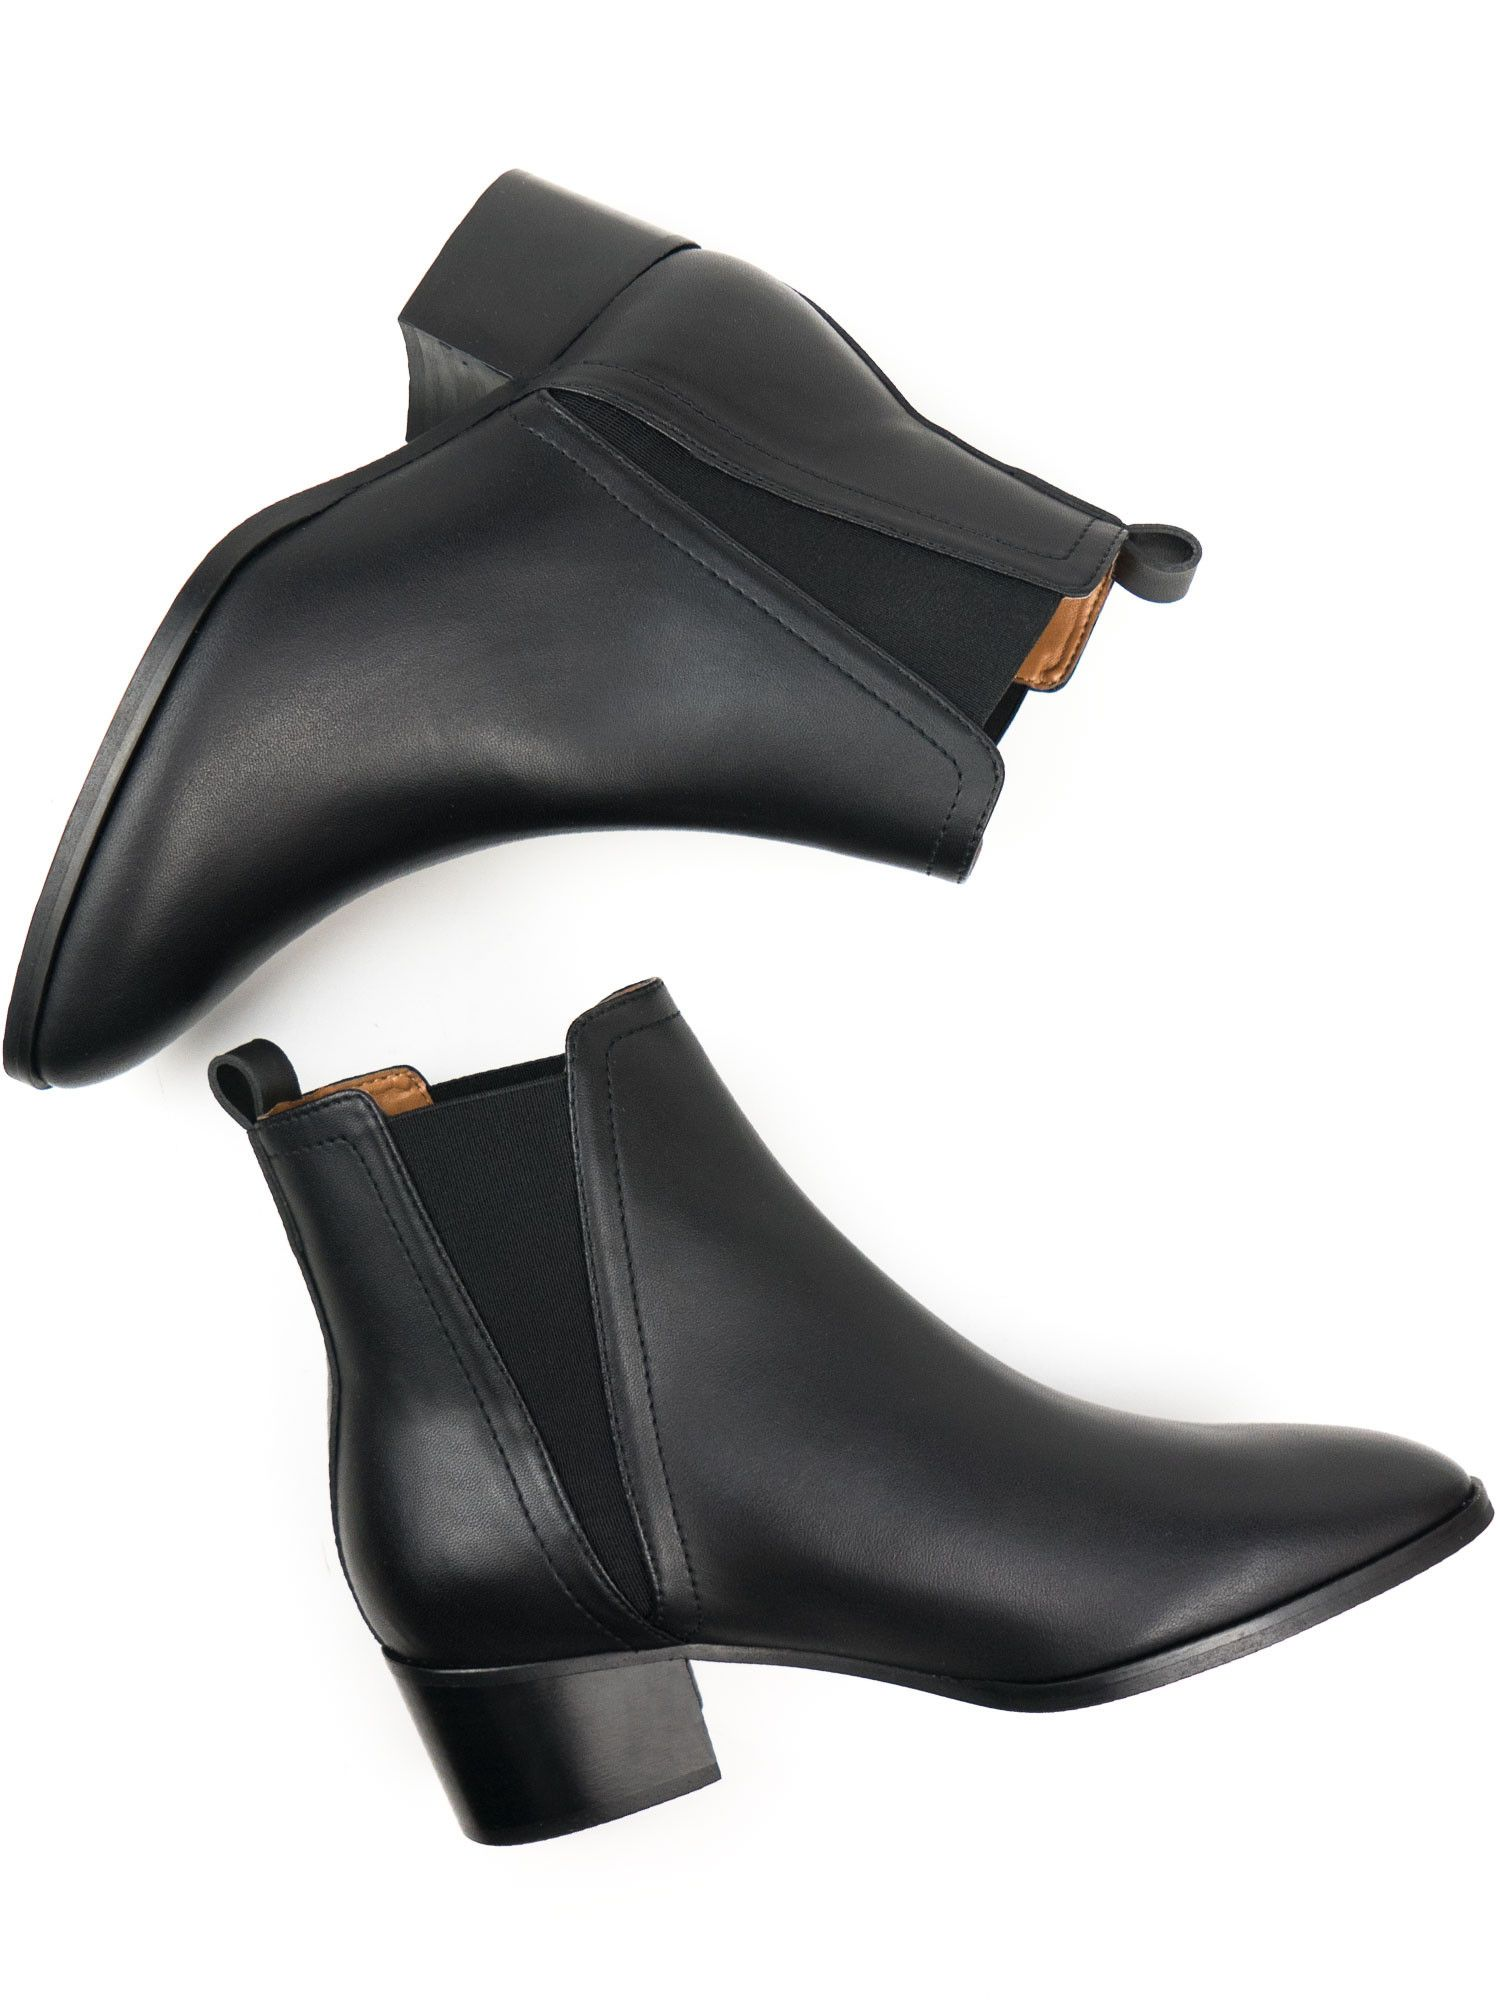 Point Toe Chelsea Boots Vegan Boots Vegan Shoes Chelsea Boots